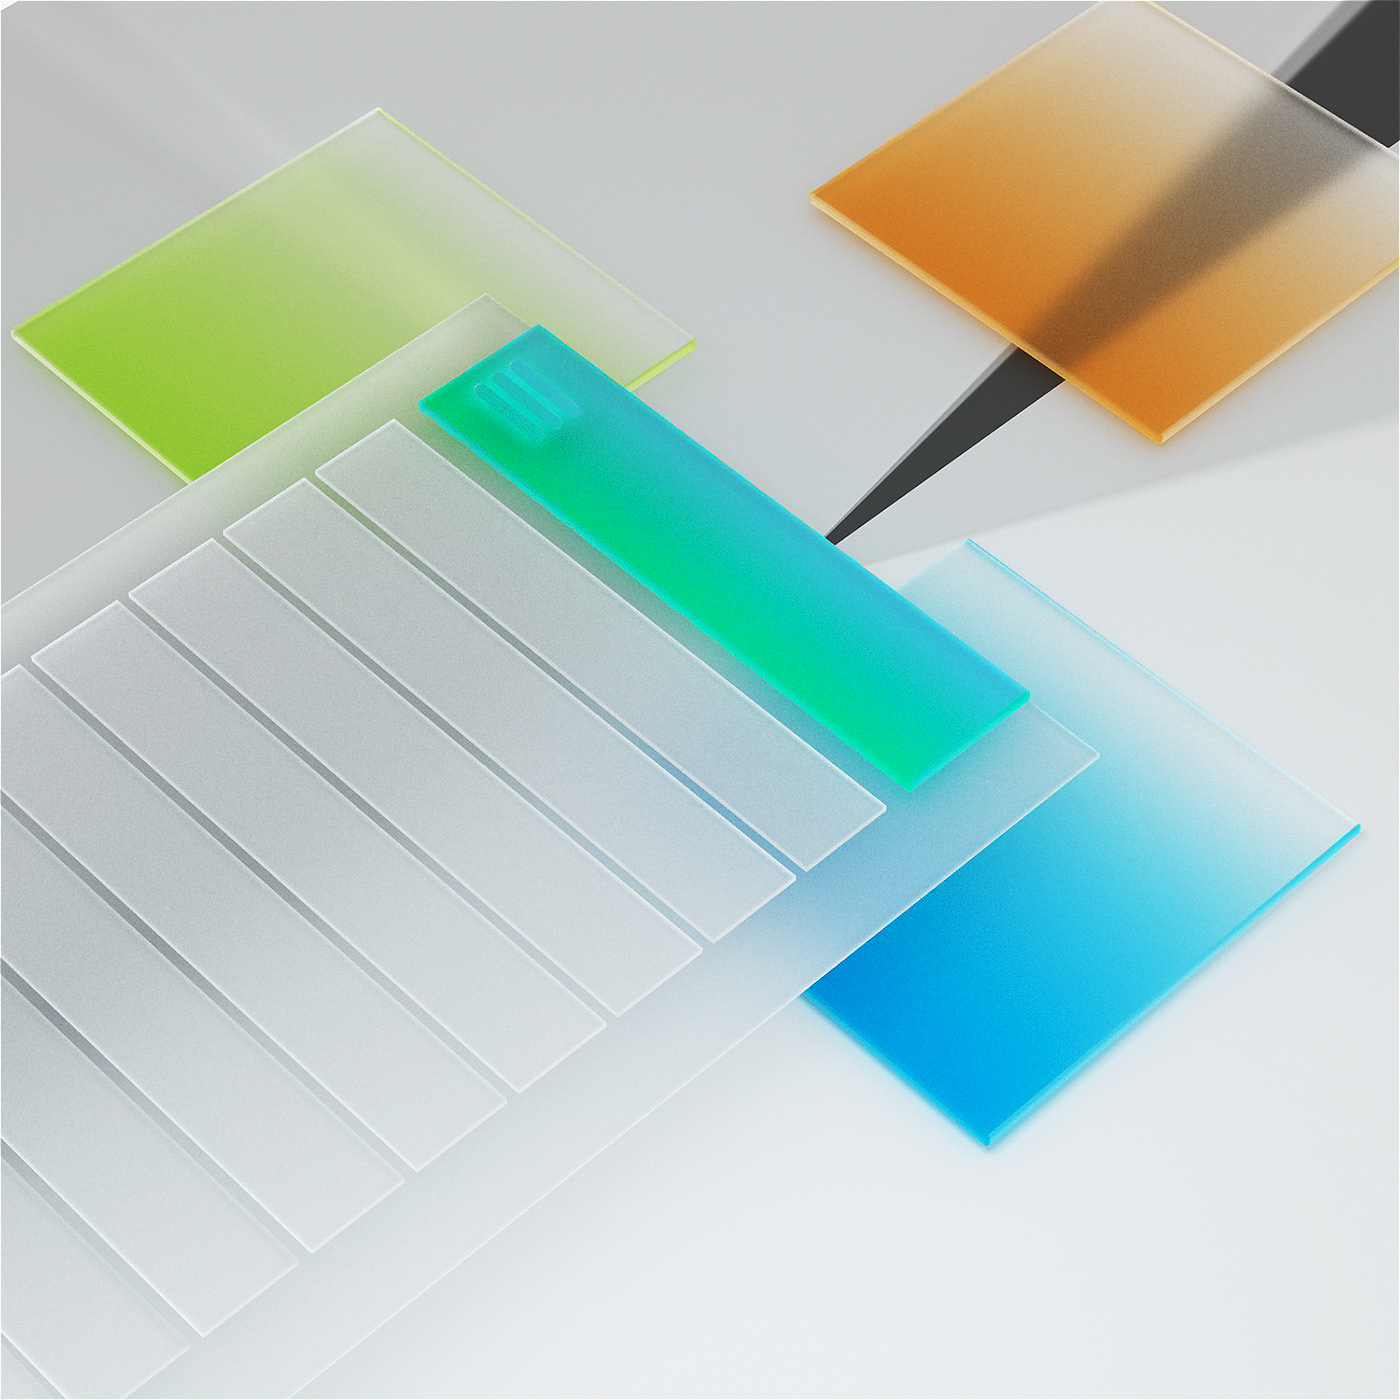 animation  Interaction design  motion graphic product design  UI UI Animation